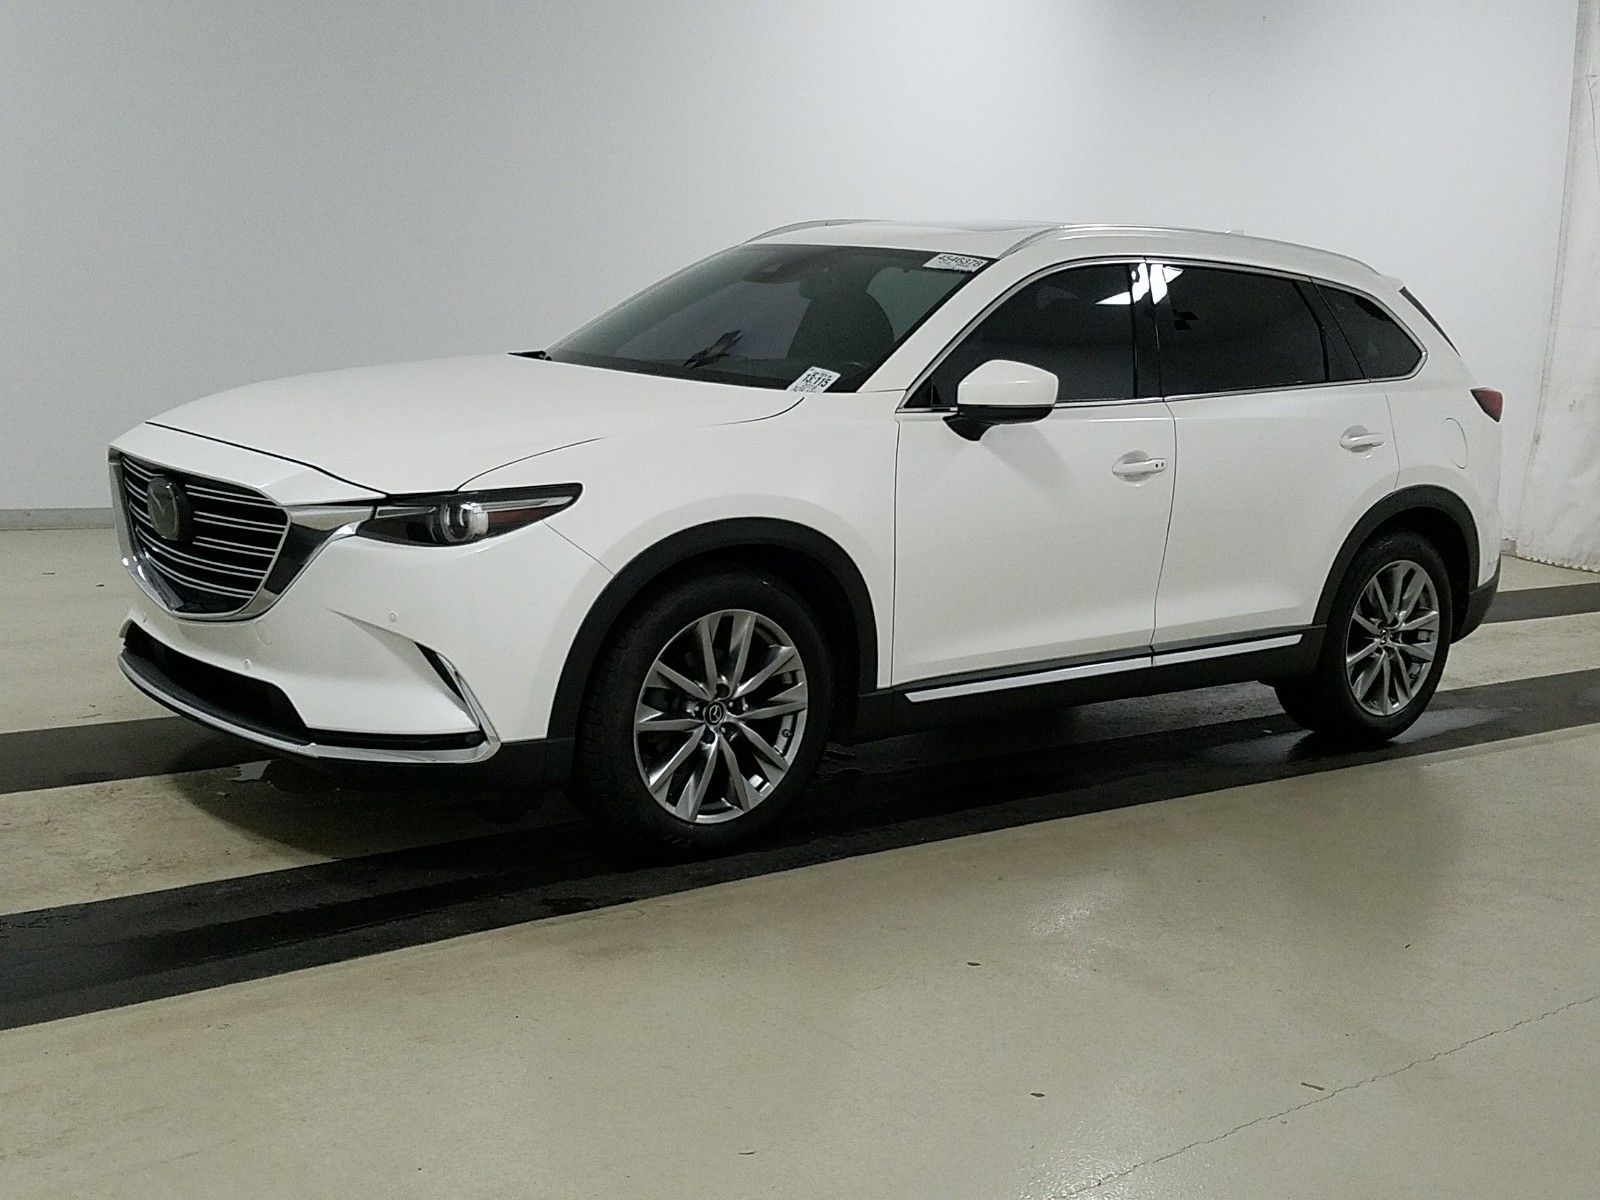 2018 Mazda Cx-9 2.5. Lot 99915993985 Vin JM3TCADYXJ0202170